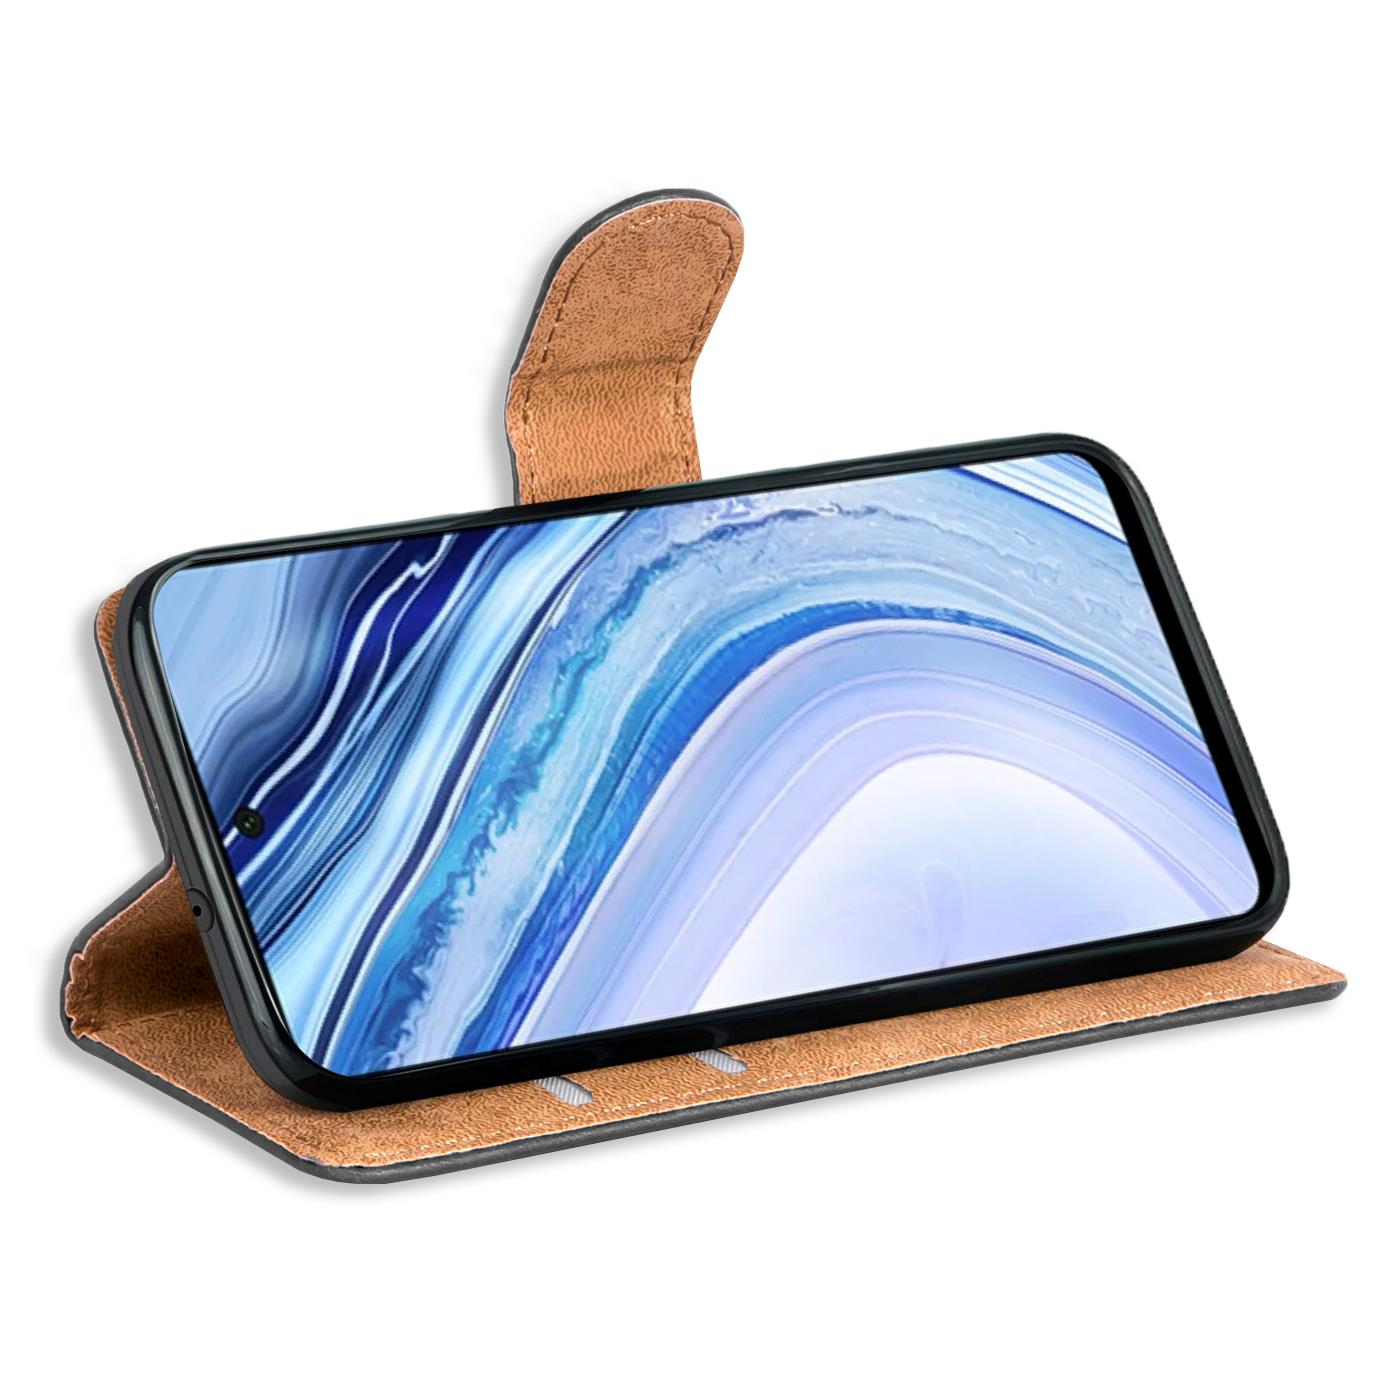 miniatura 10 - Book Case für Xiaomi Redmi Note 9 Pro / Note 9S Hülle Handy Tasche Flip Cover